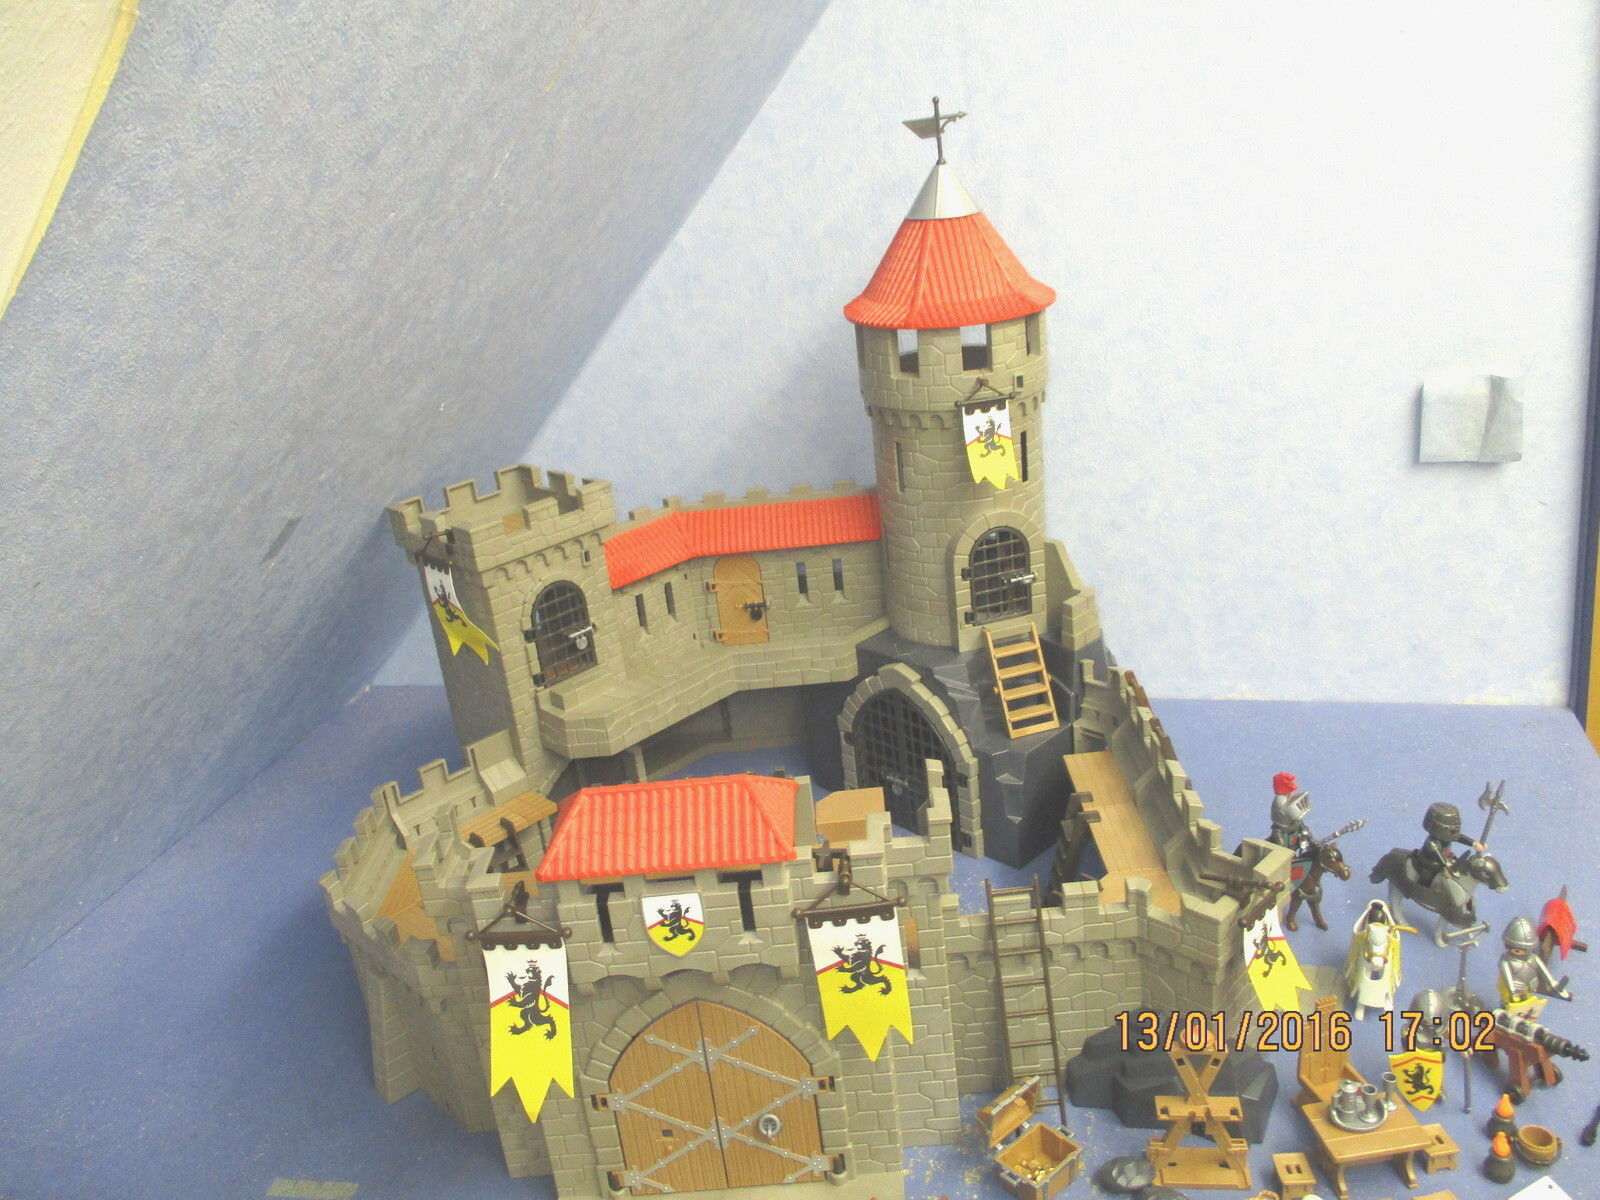 4865 Ritterburg Löwenritterburg 2 Kanonen  Ritter Knigths Caste  Playmobil 3998